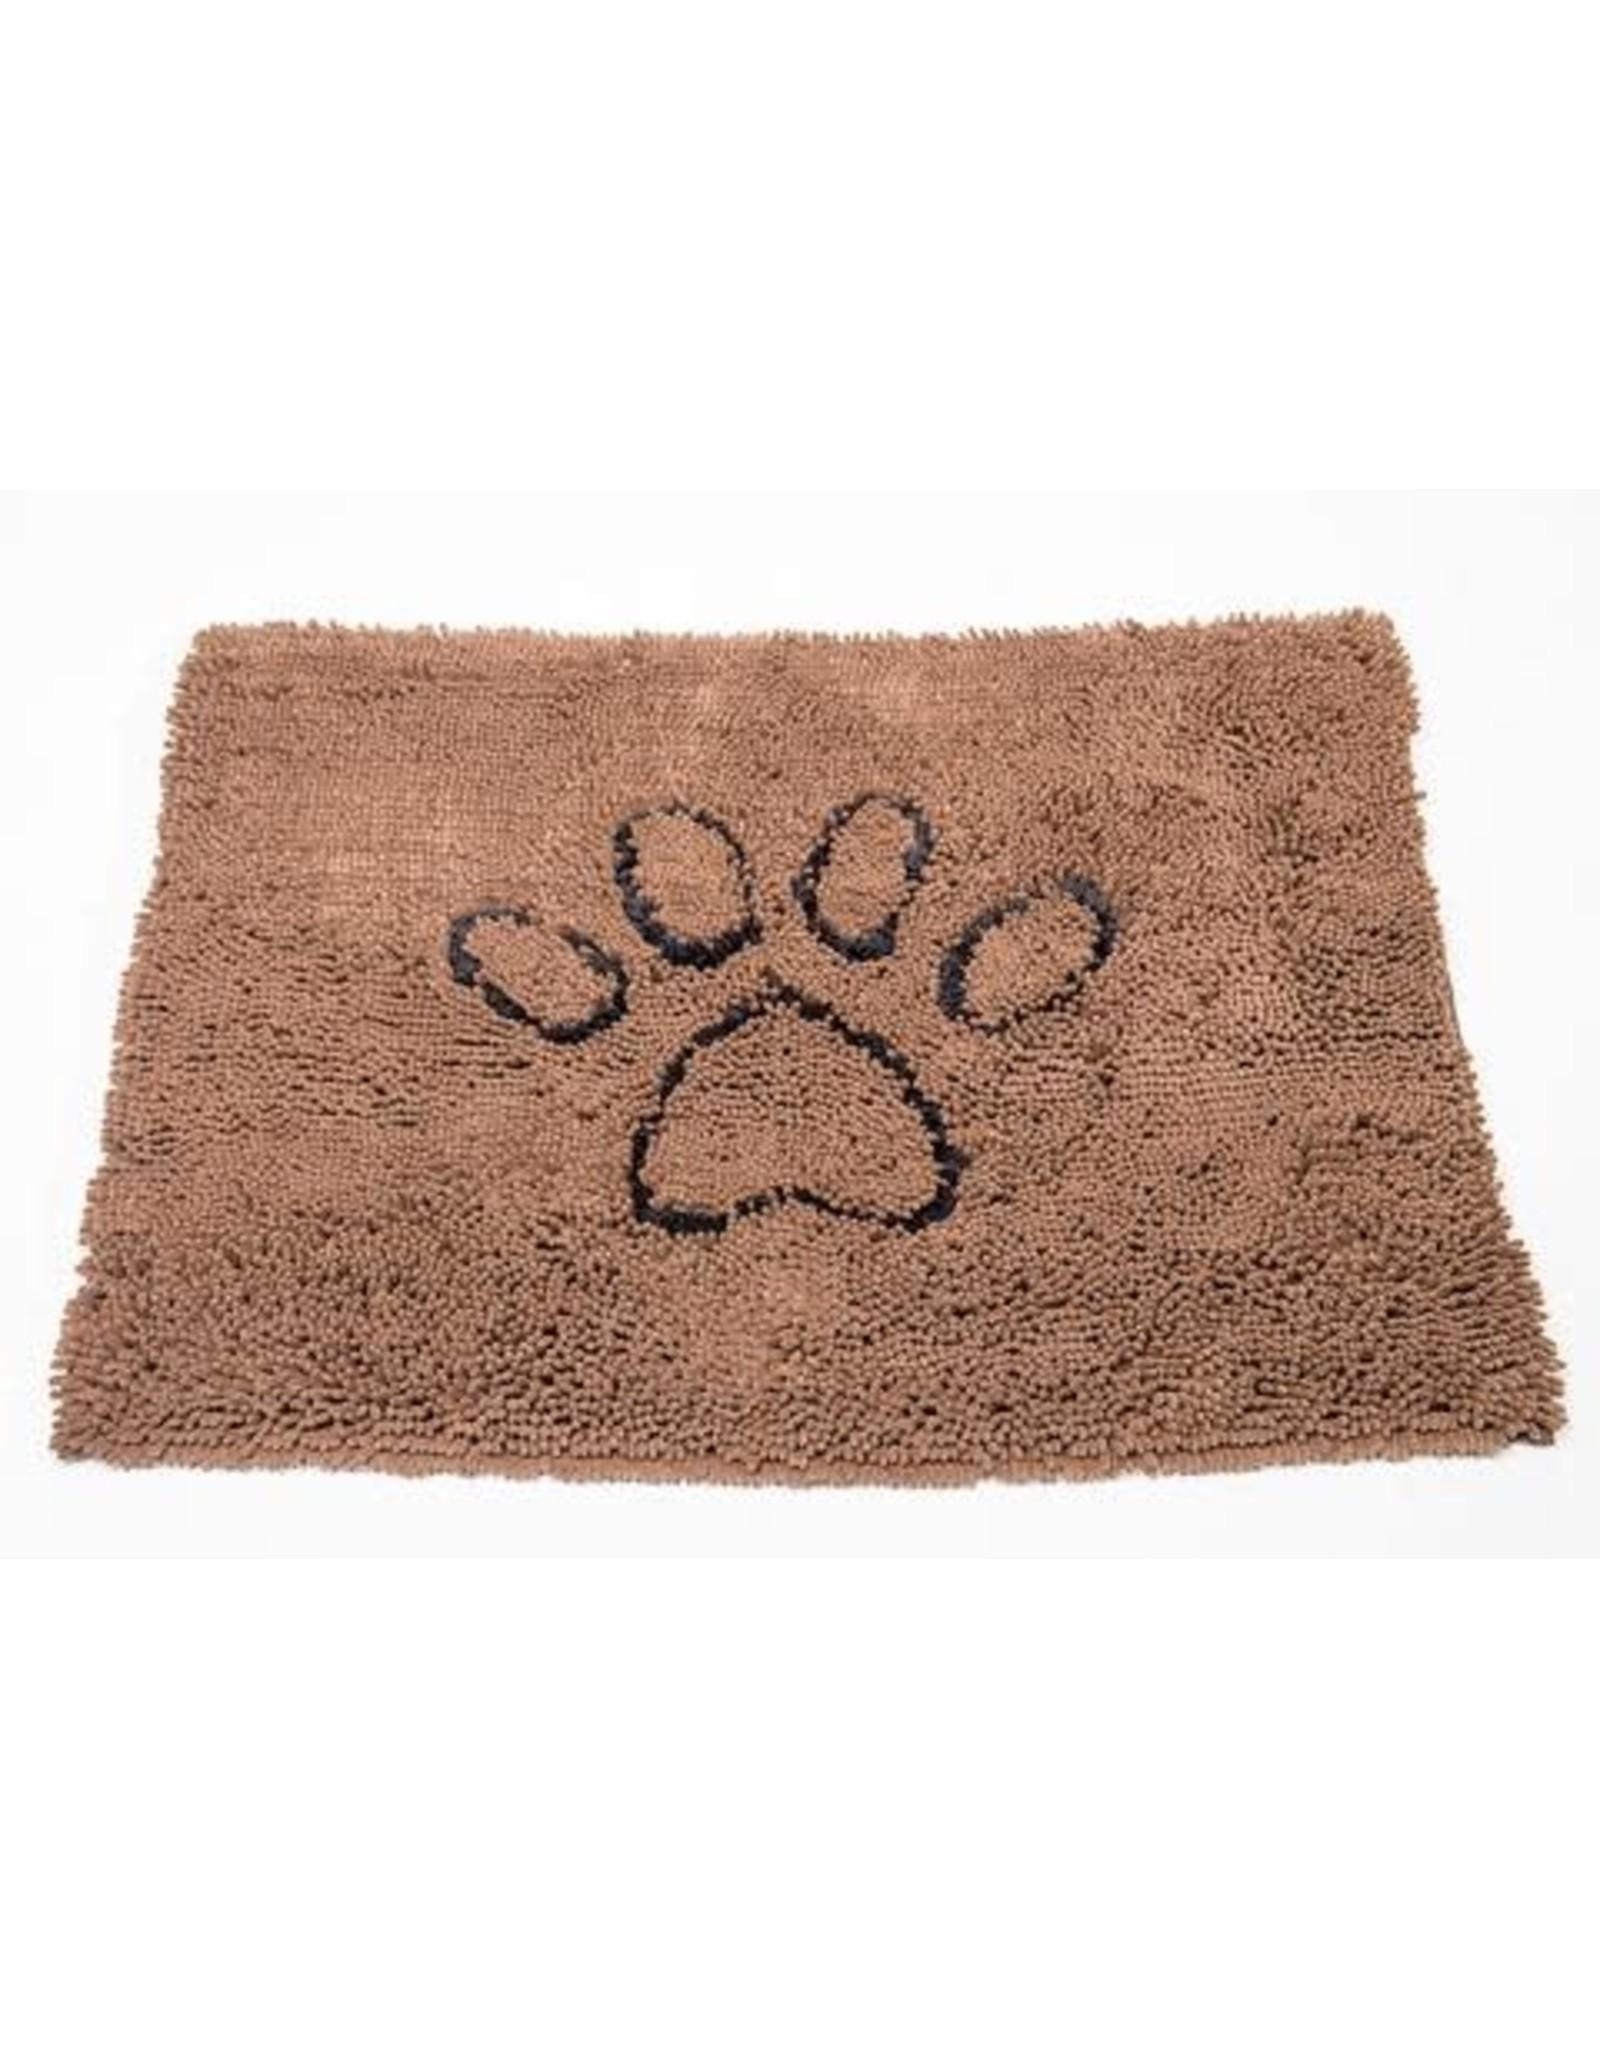 DogGoneSmart DGS Dirty Dog Doormat Large 26x35 Brown